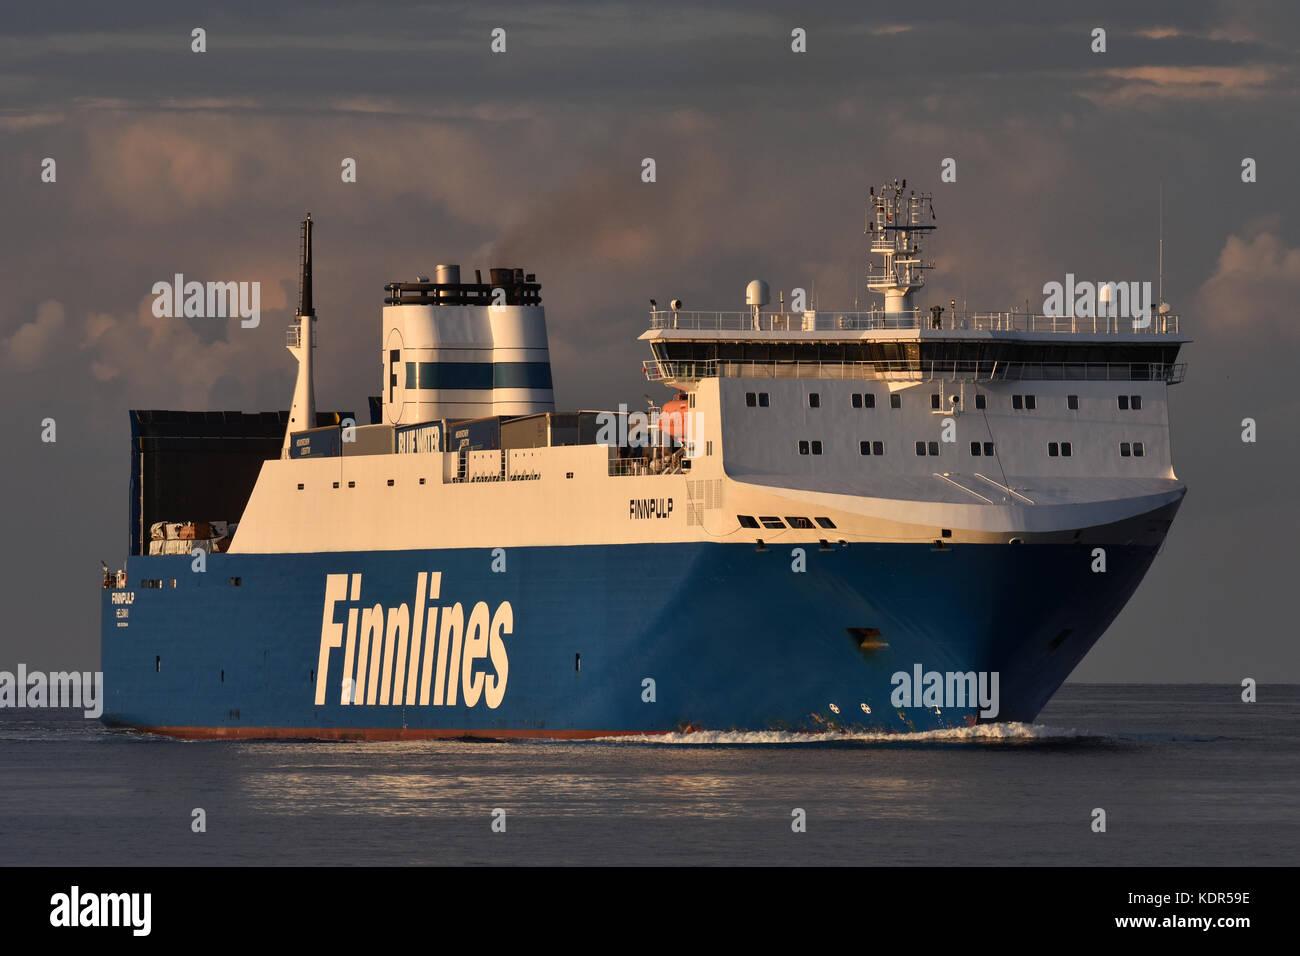 Finnpulp - Stock Image